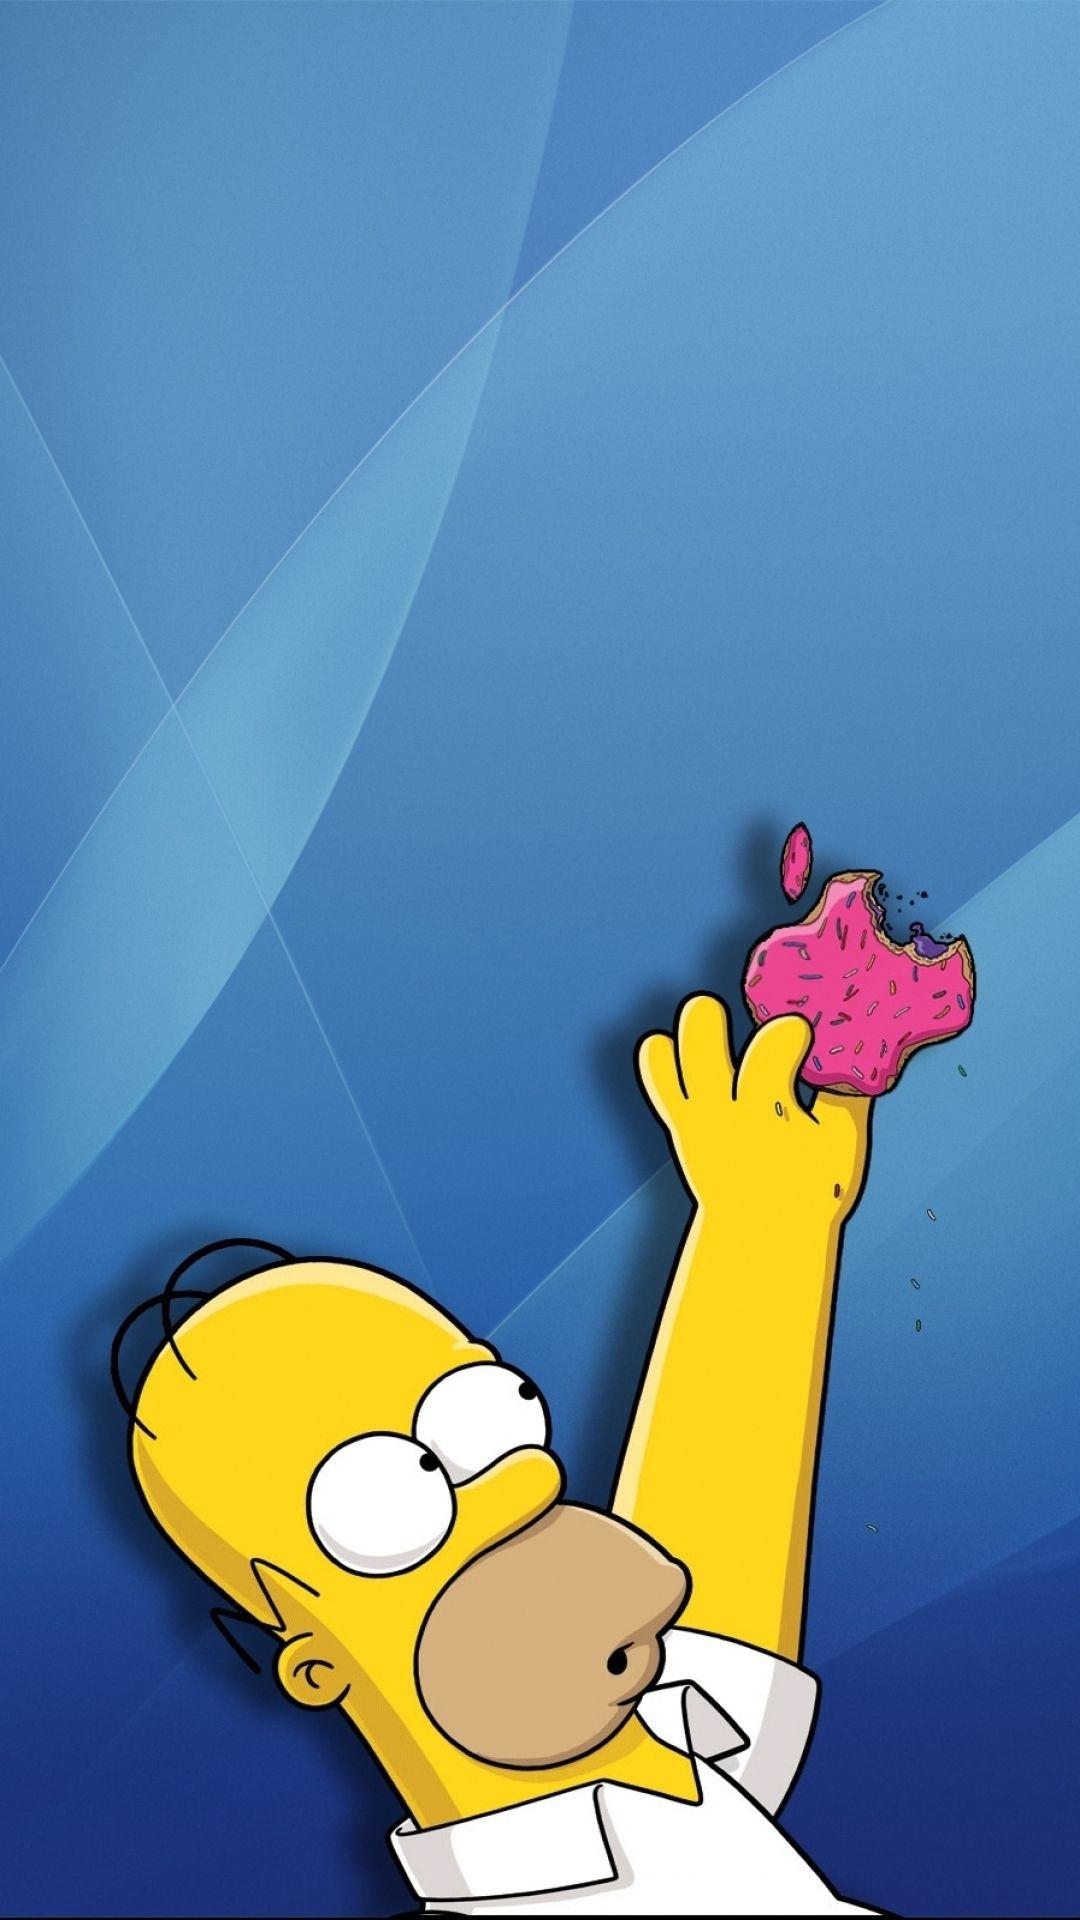 The Simpsons Wallpaper Iphone Download Best The Simpsons Wallpaper